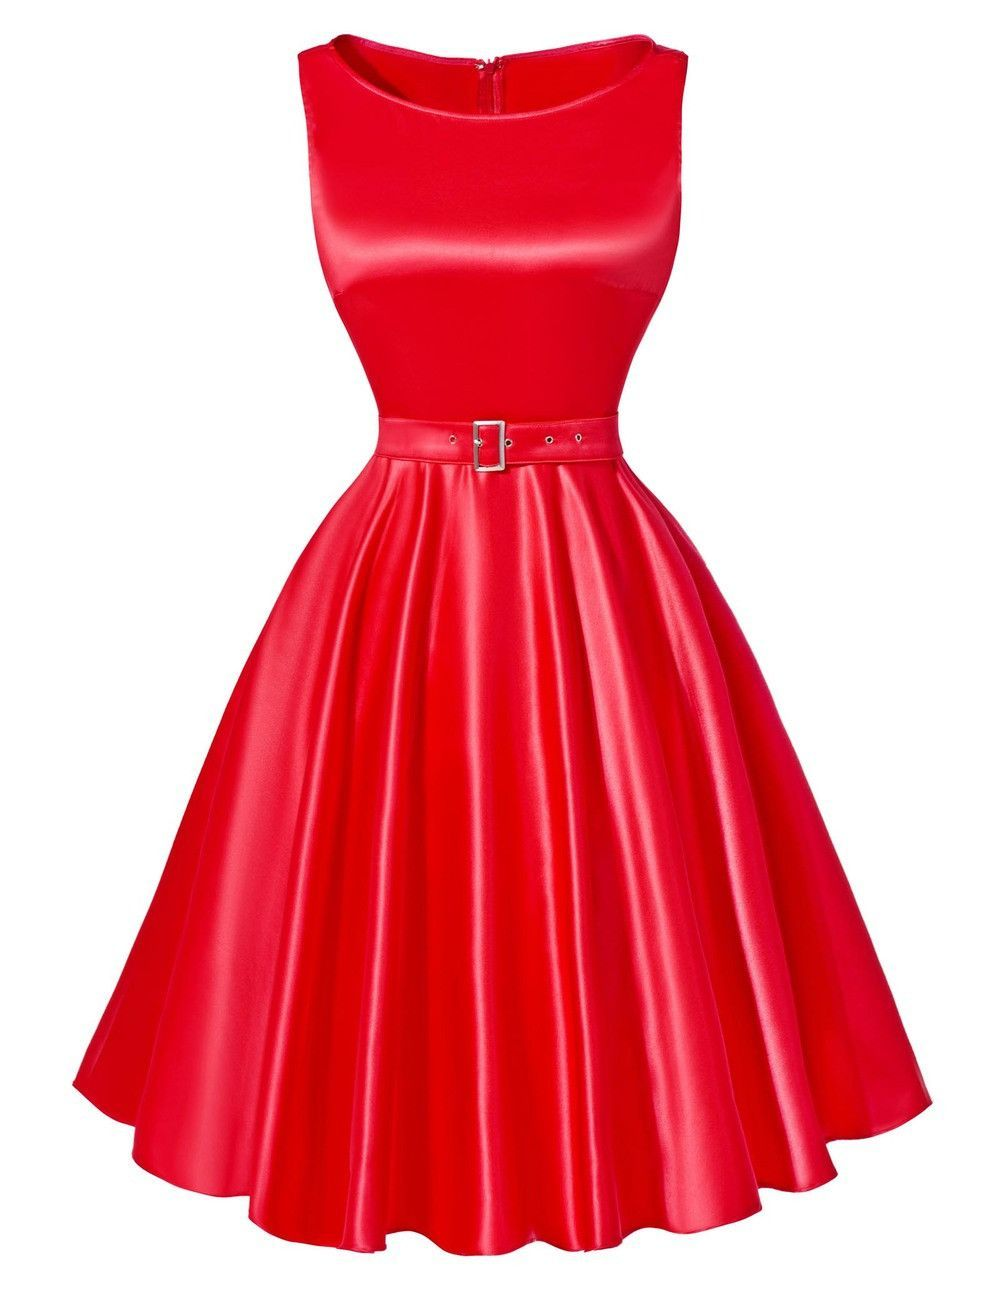 Jurken Women Dress Black Red Purple Summer Audrey Hepburn 50s 60s Vintage  Dresses Vestidos Plus Size Rockabilly Party Dress af02a7ebe4ff